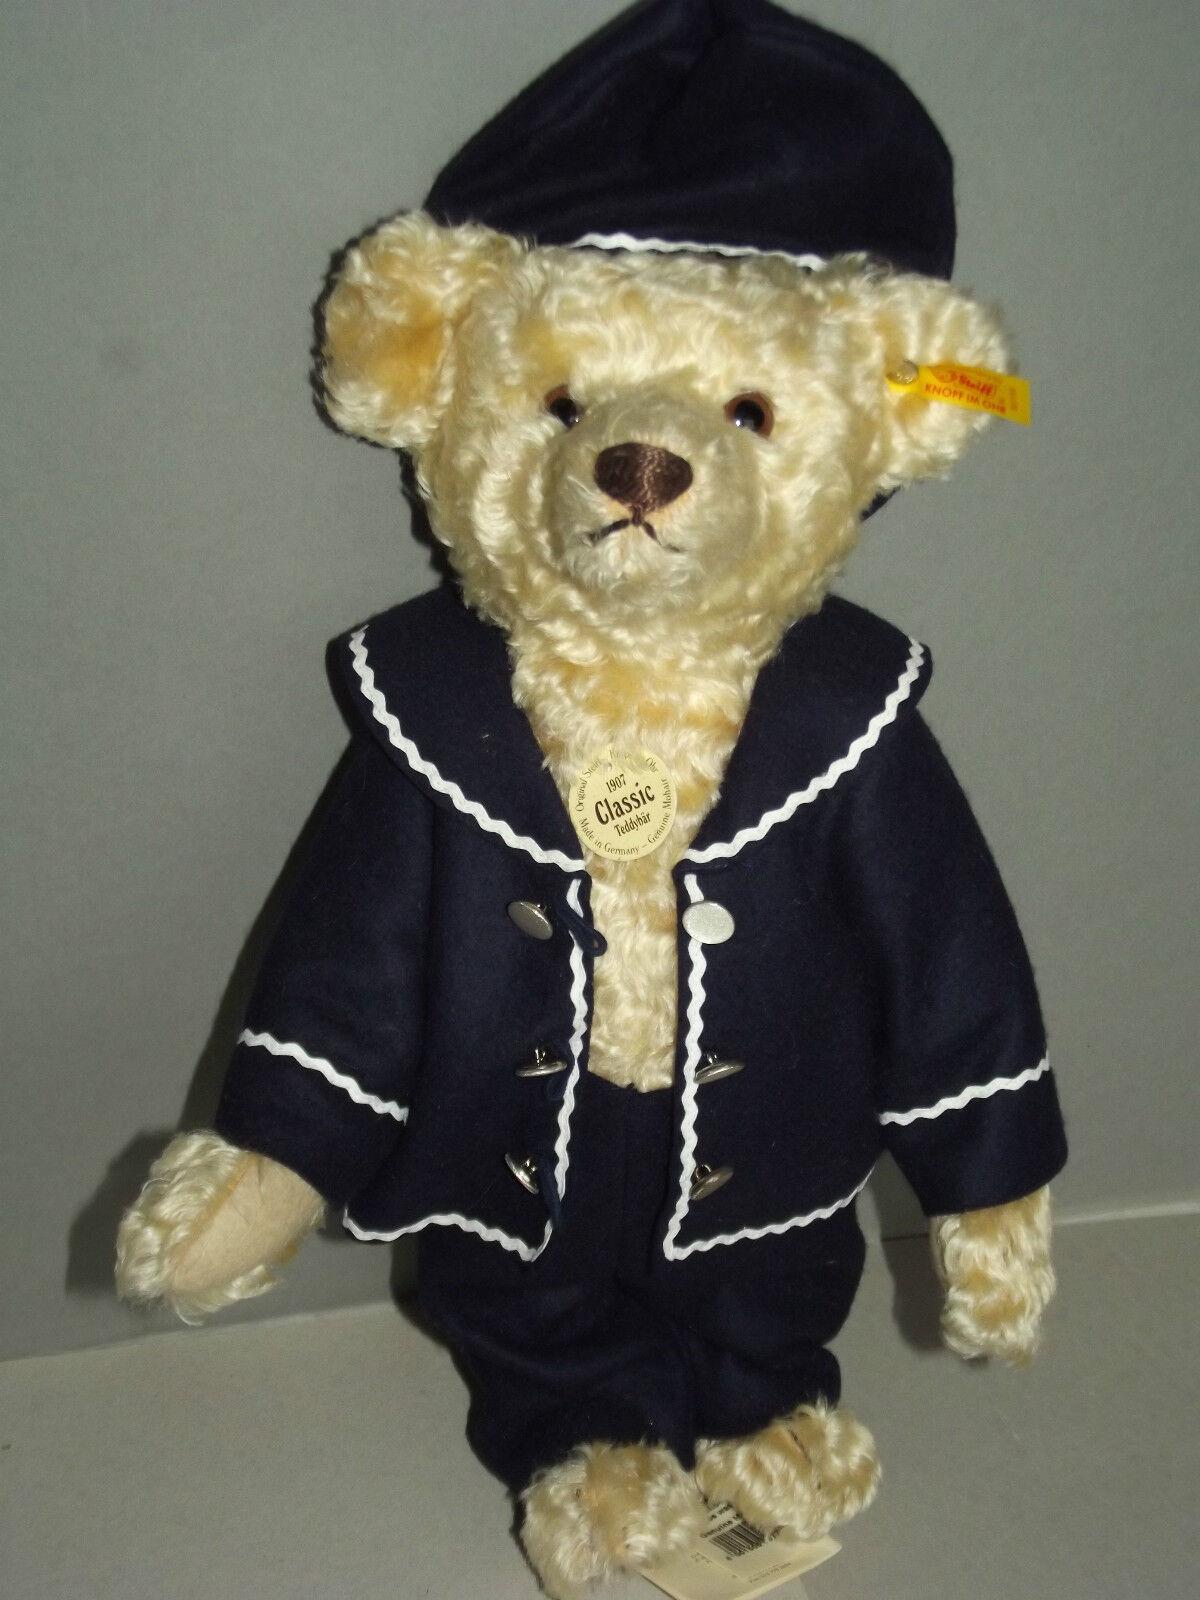 Steiff Teddy Nr.027758  Classic Teddybaer 1907 mit Anzug Anzug Anzug von 1997 26 cm neuw. 60d37f